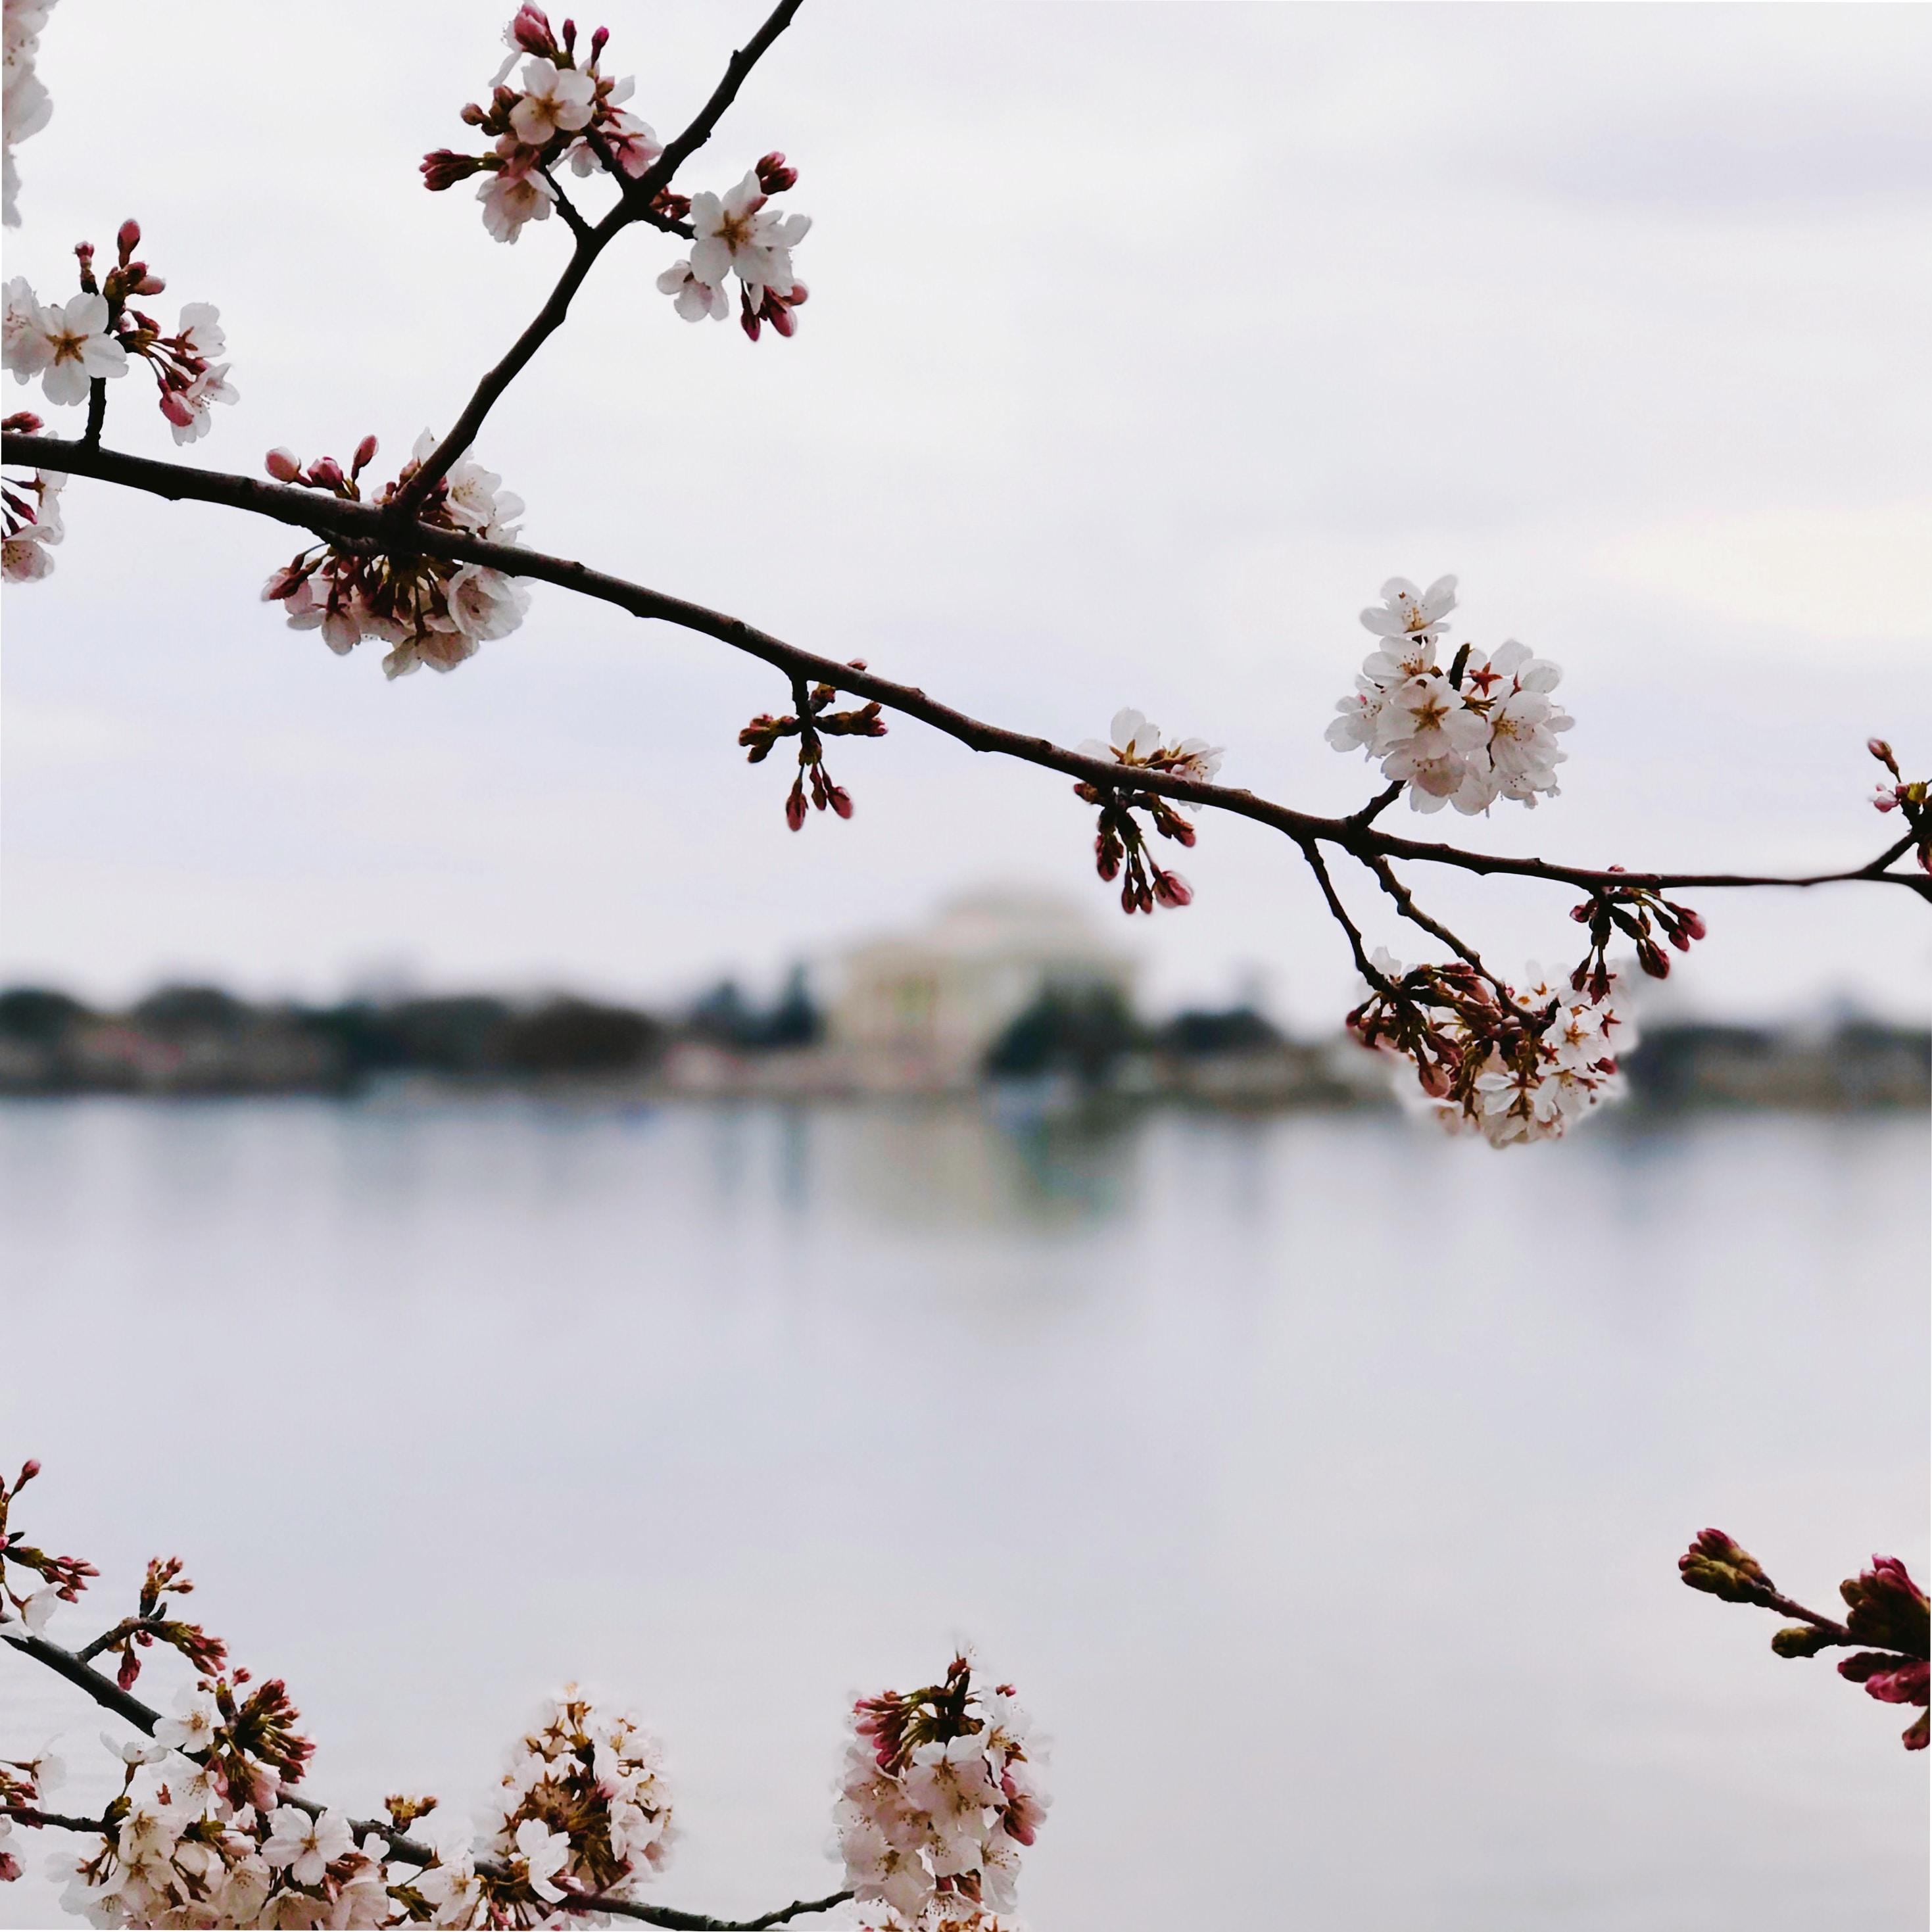 tilt-shift photography of sakura tree